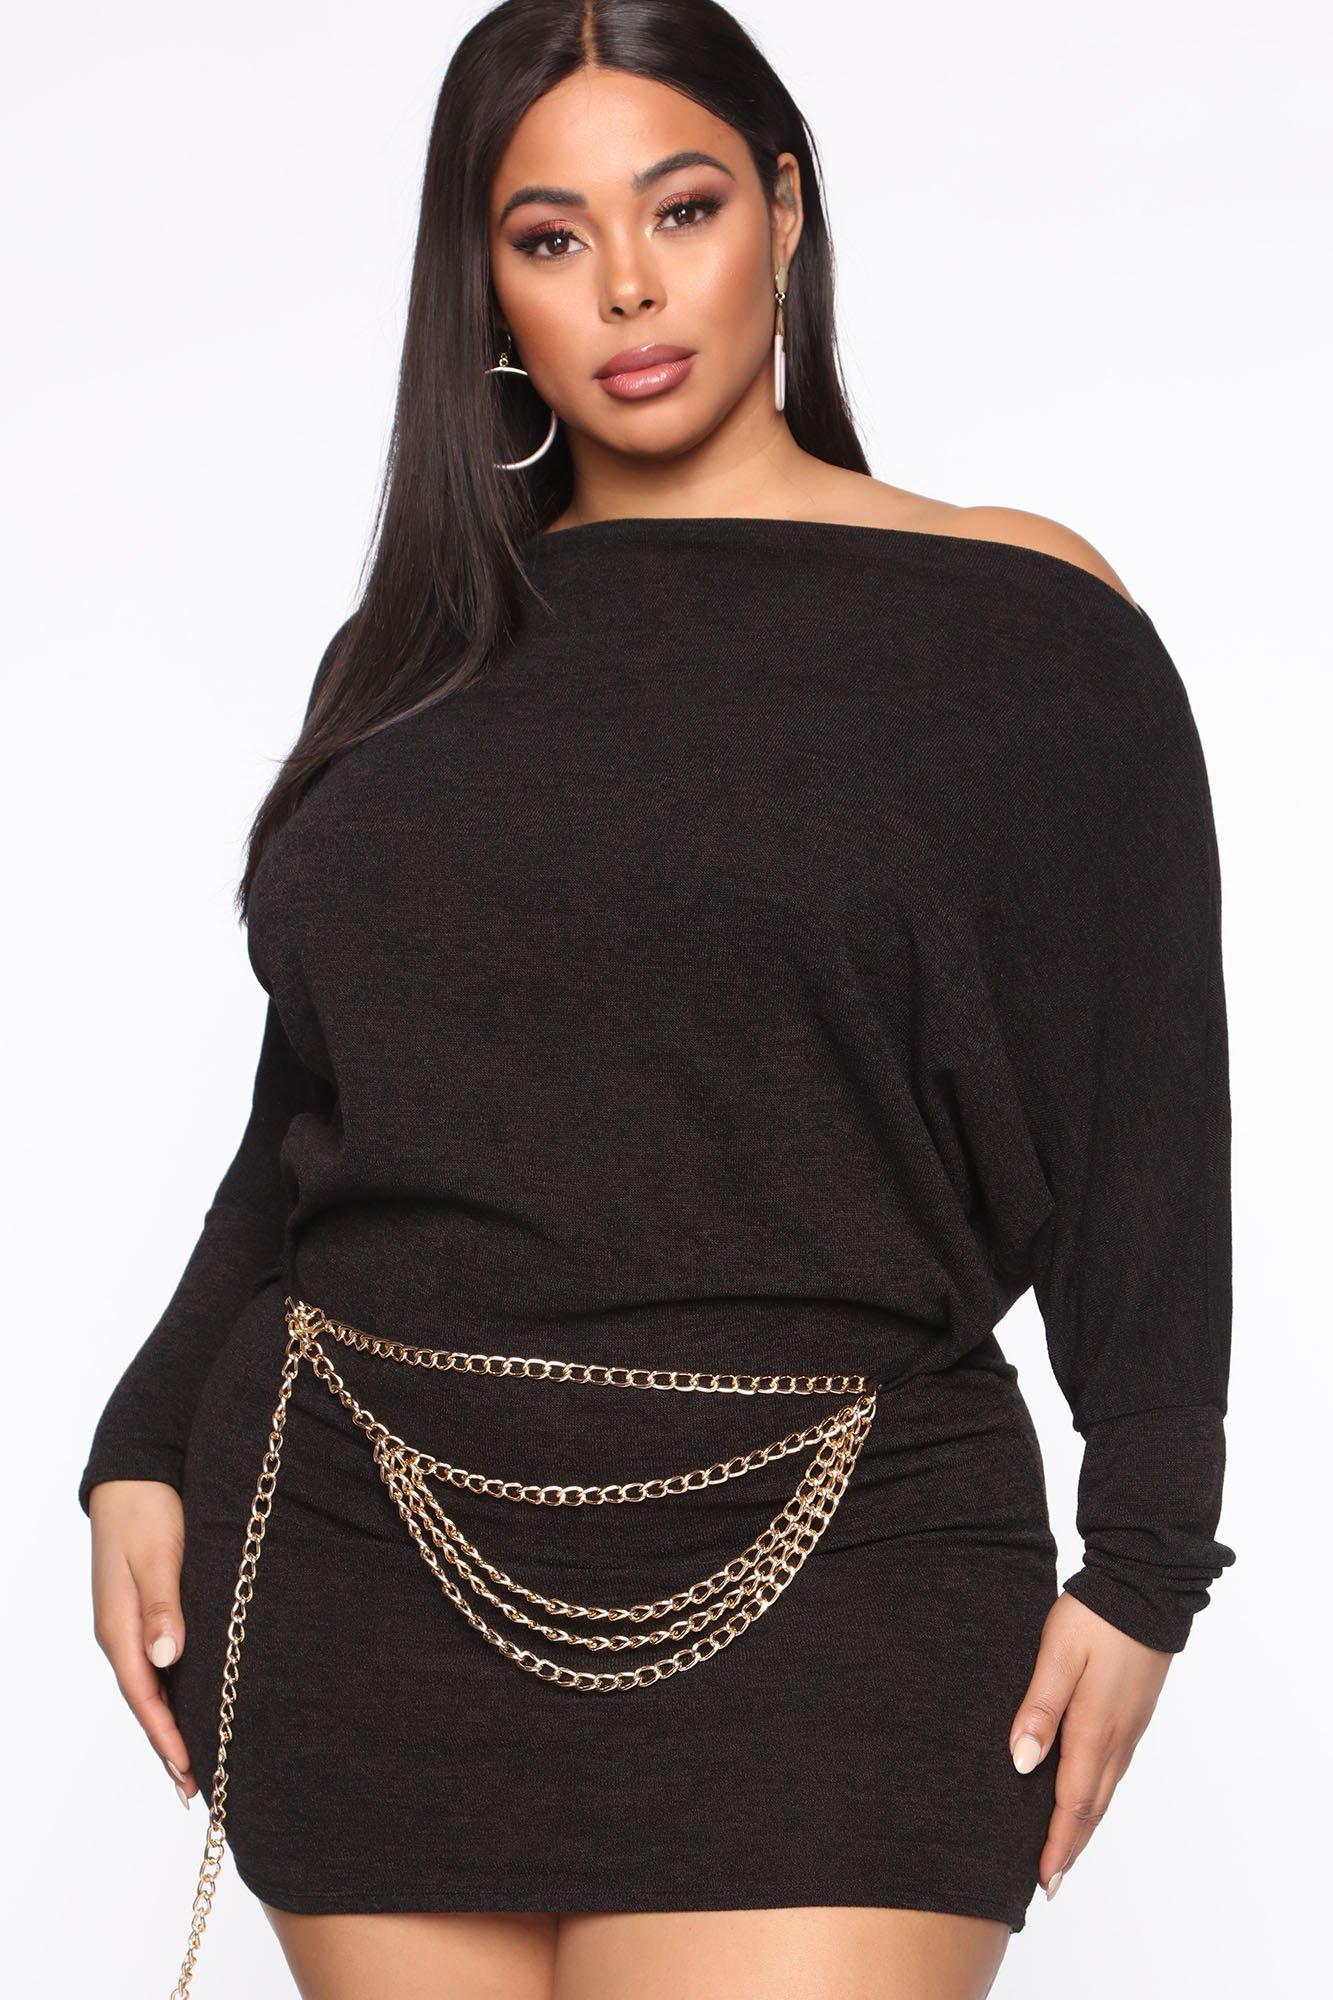 Mini-Robe Never Waisting Time - Noir - Grandes tailles